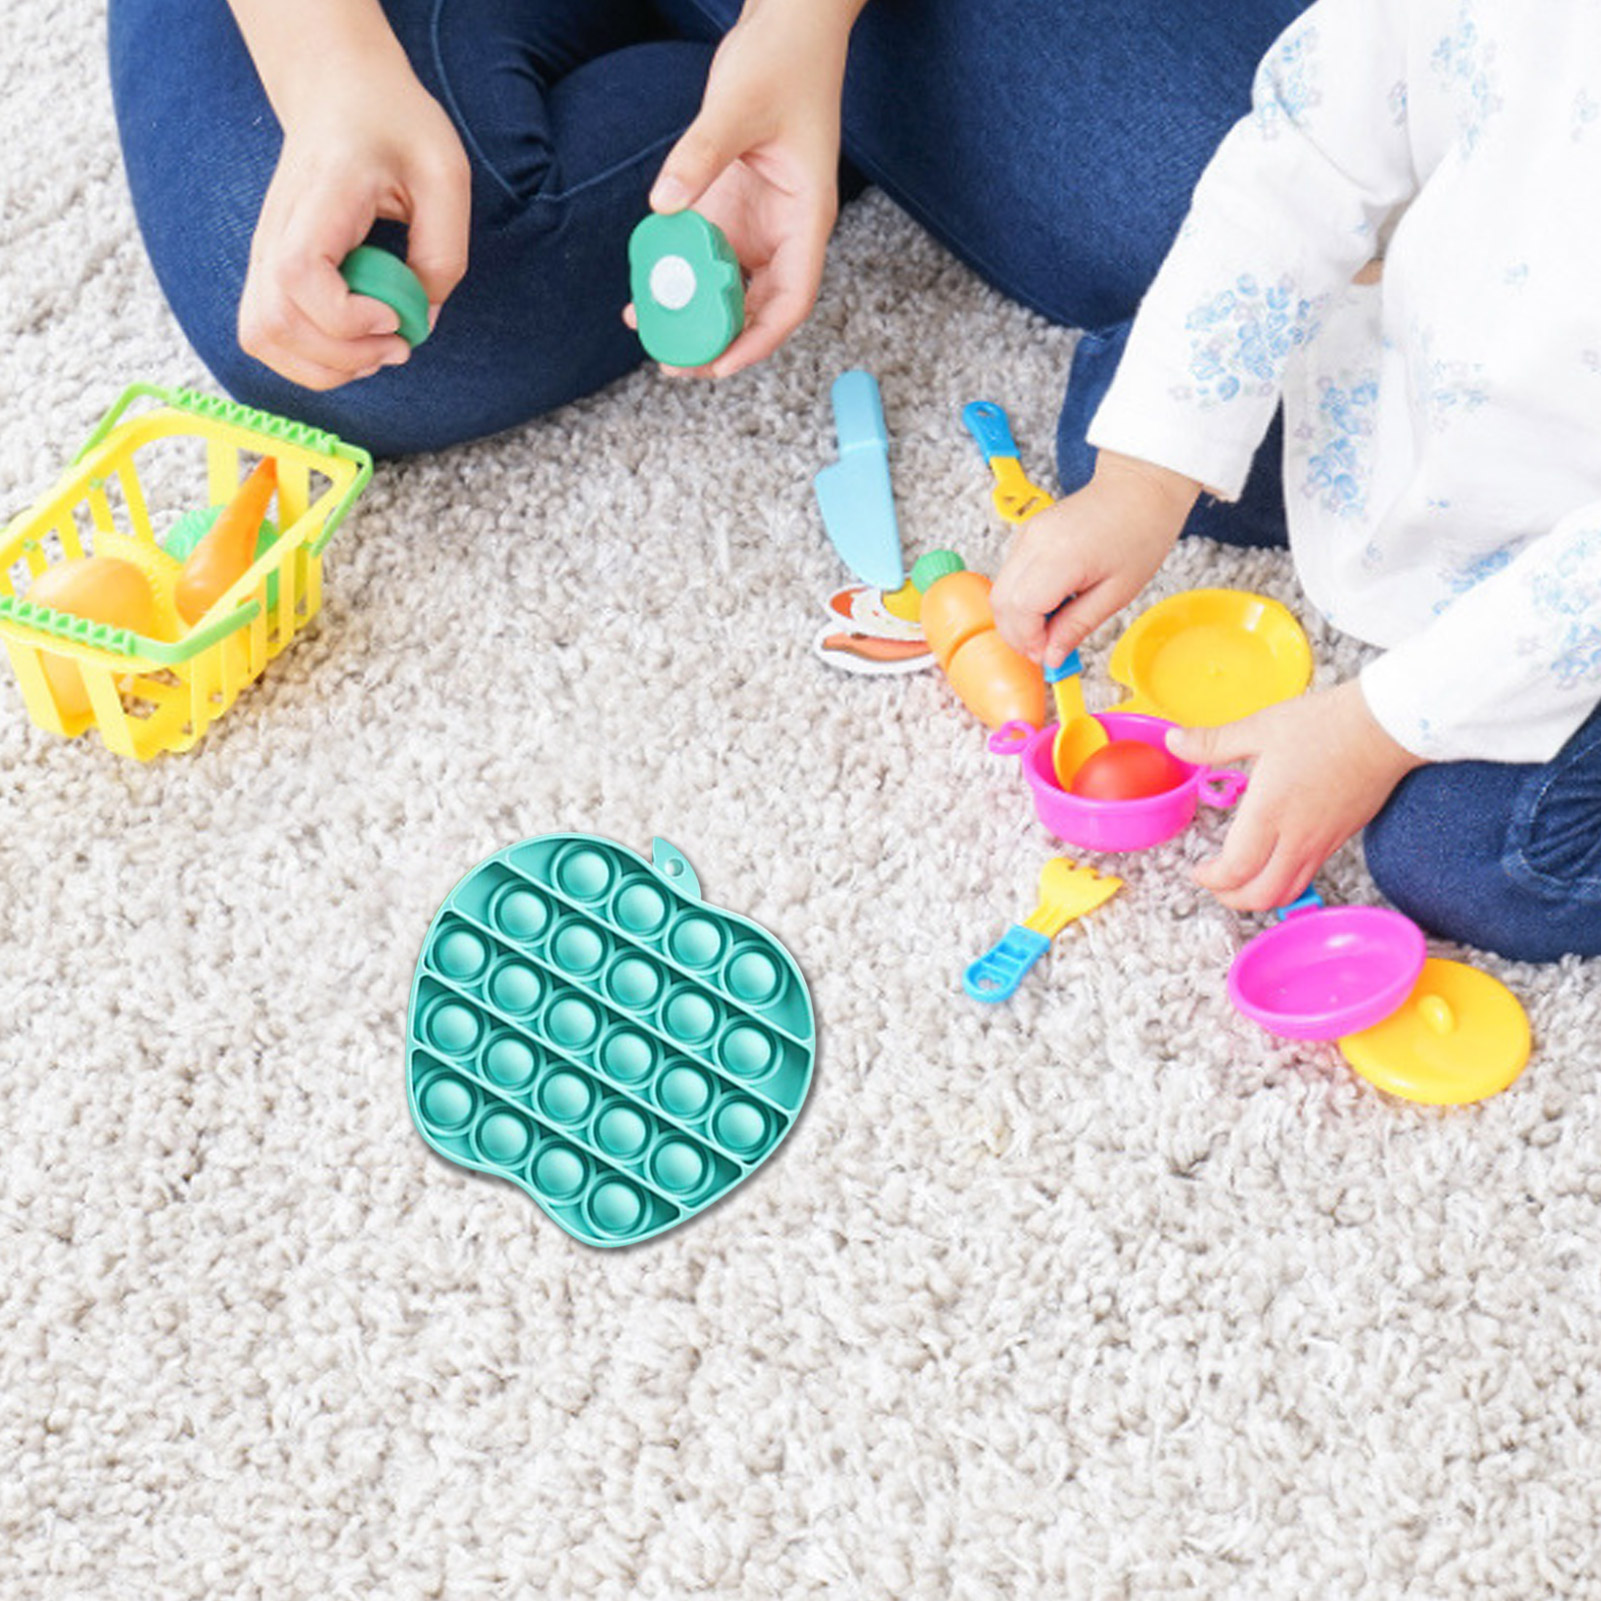 Adult Toys Fidget Rainbow Bubble-Sensory Squishy Pop-It Push-Pops Needs Anti-Stress Children img2